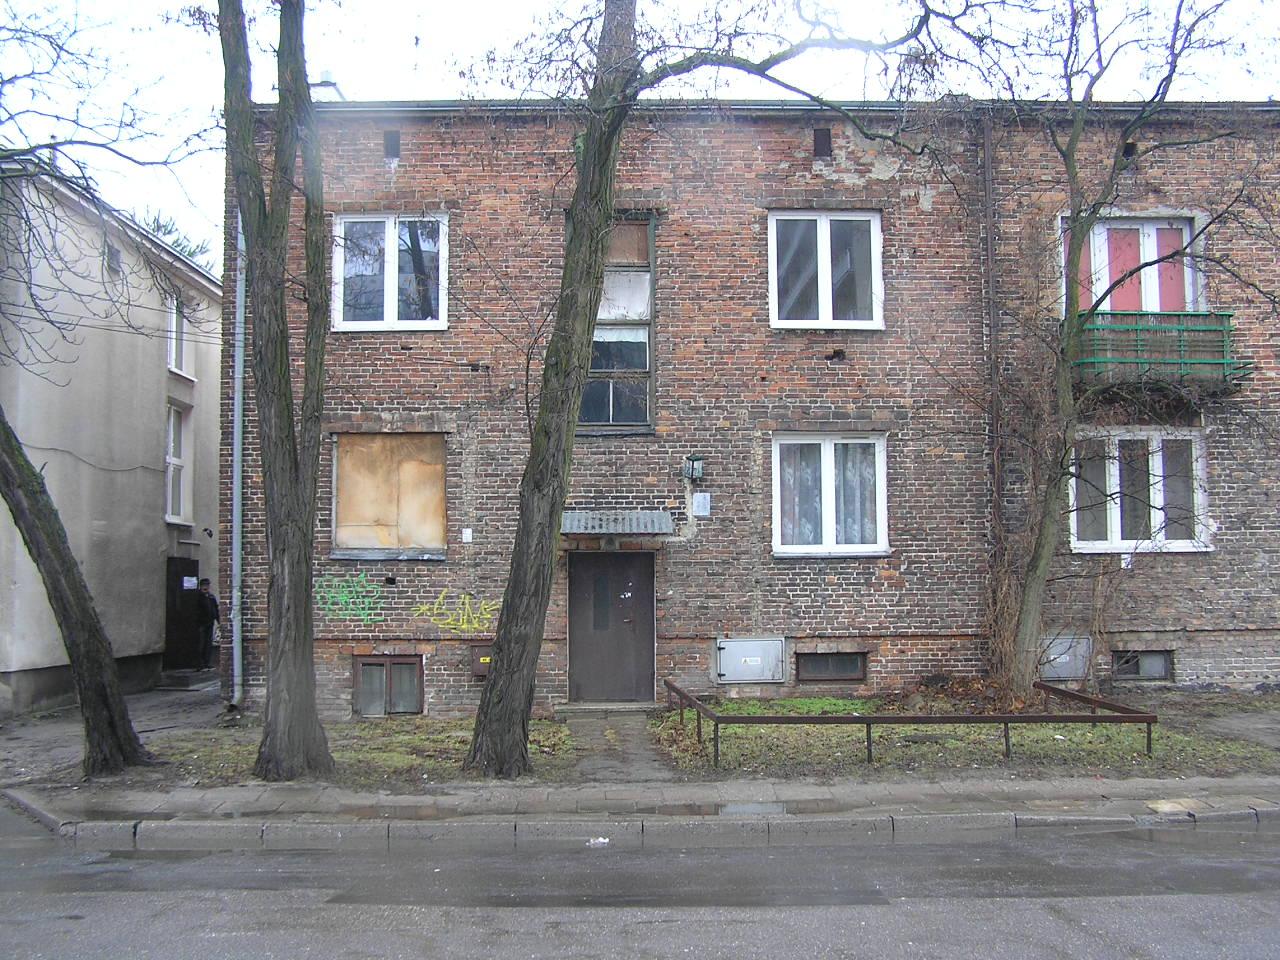 Omulewska 23